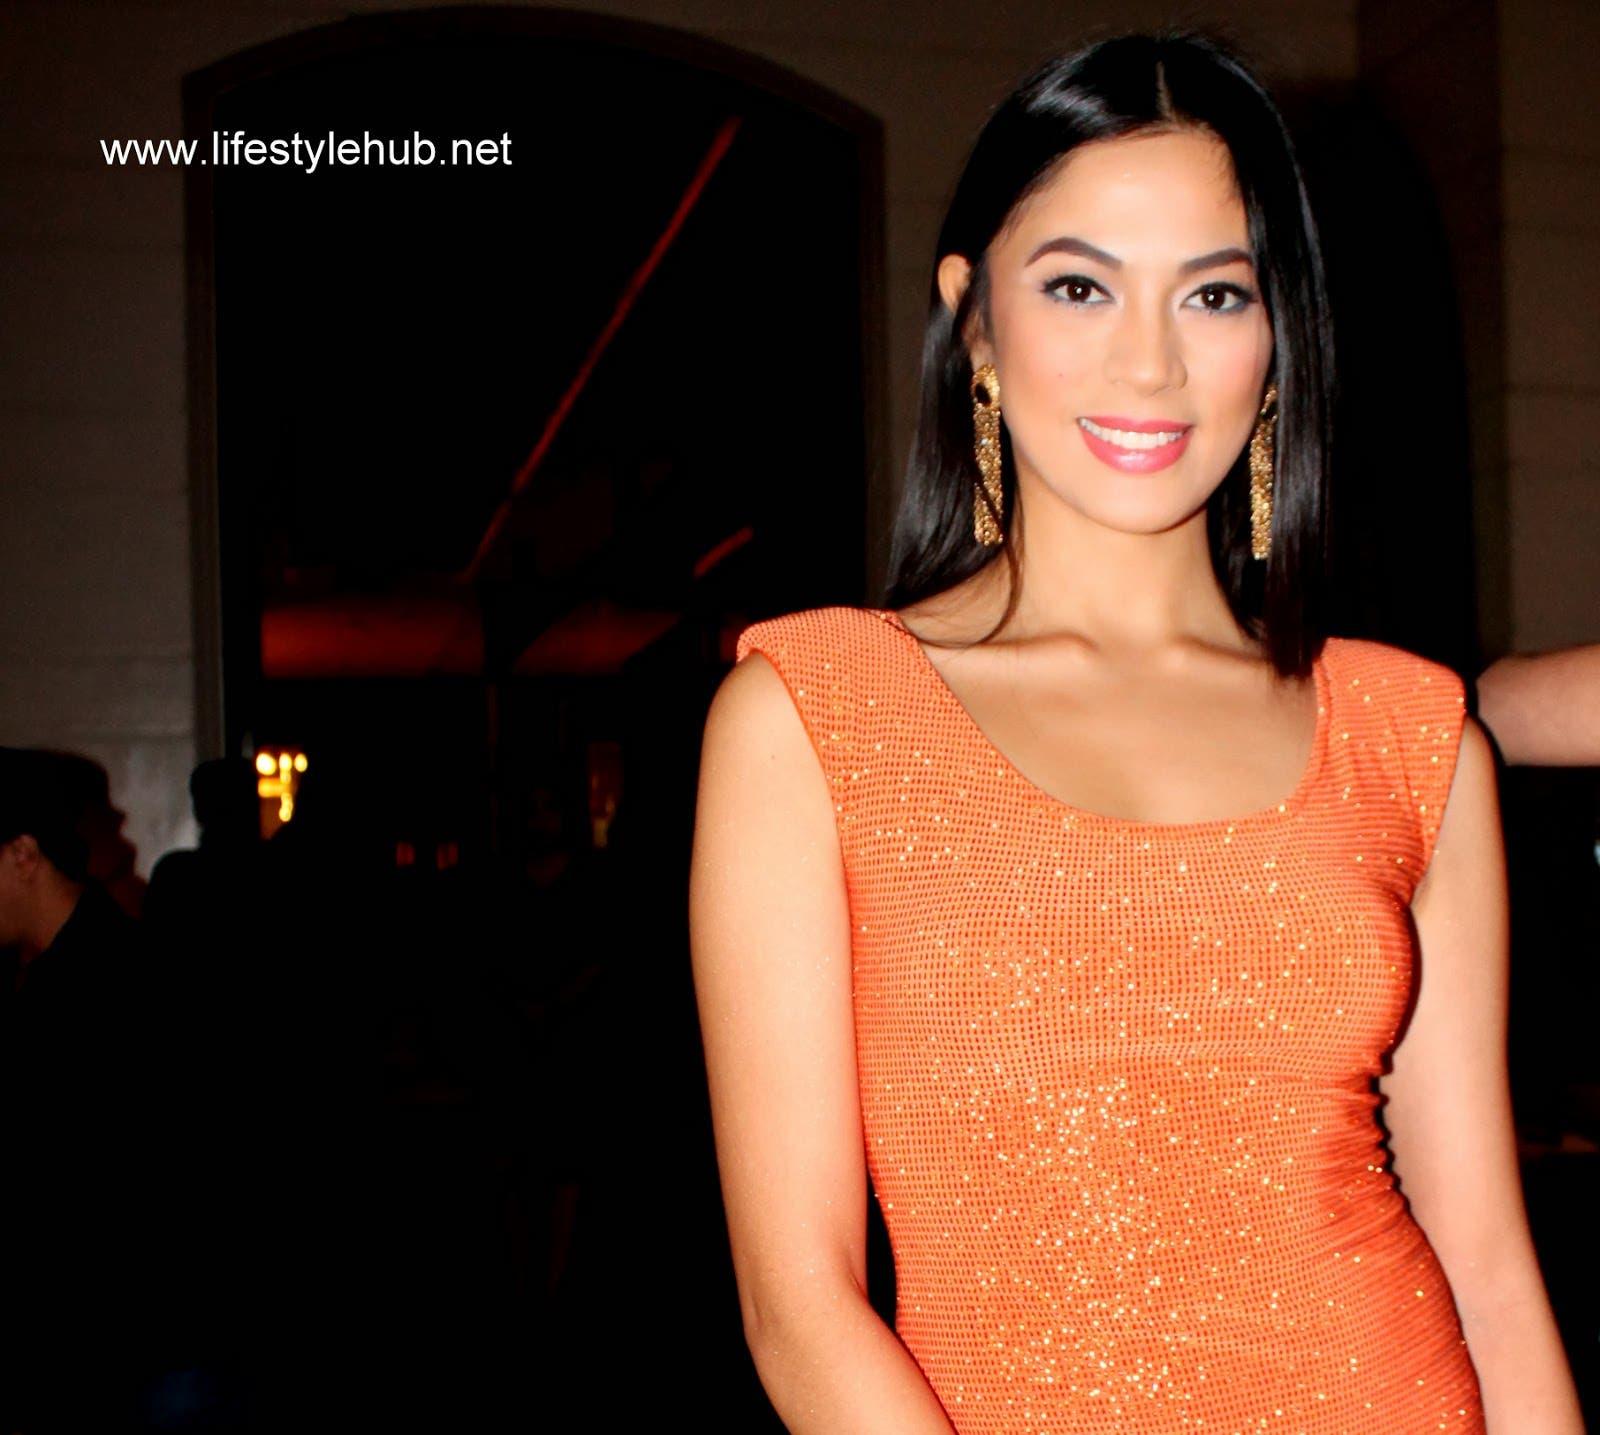 Ariella arida gets spotlight at metro body show off 2014 for Arienti arreda